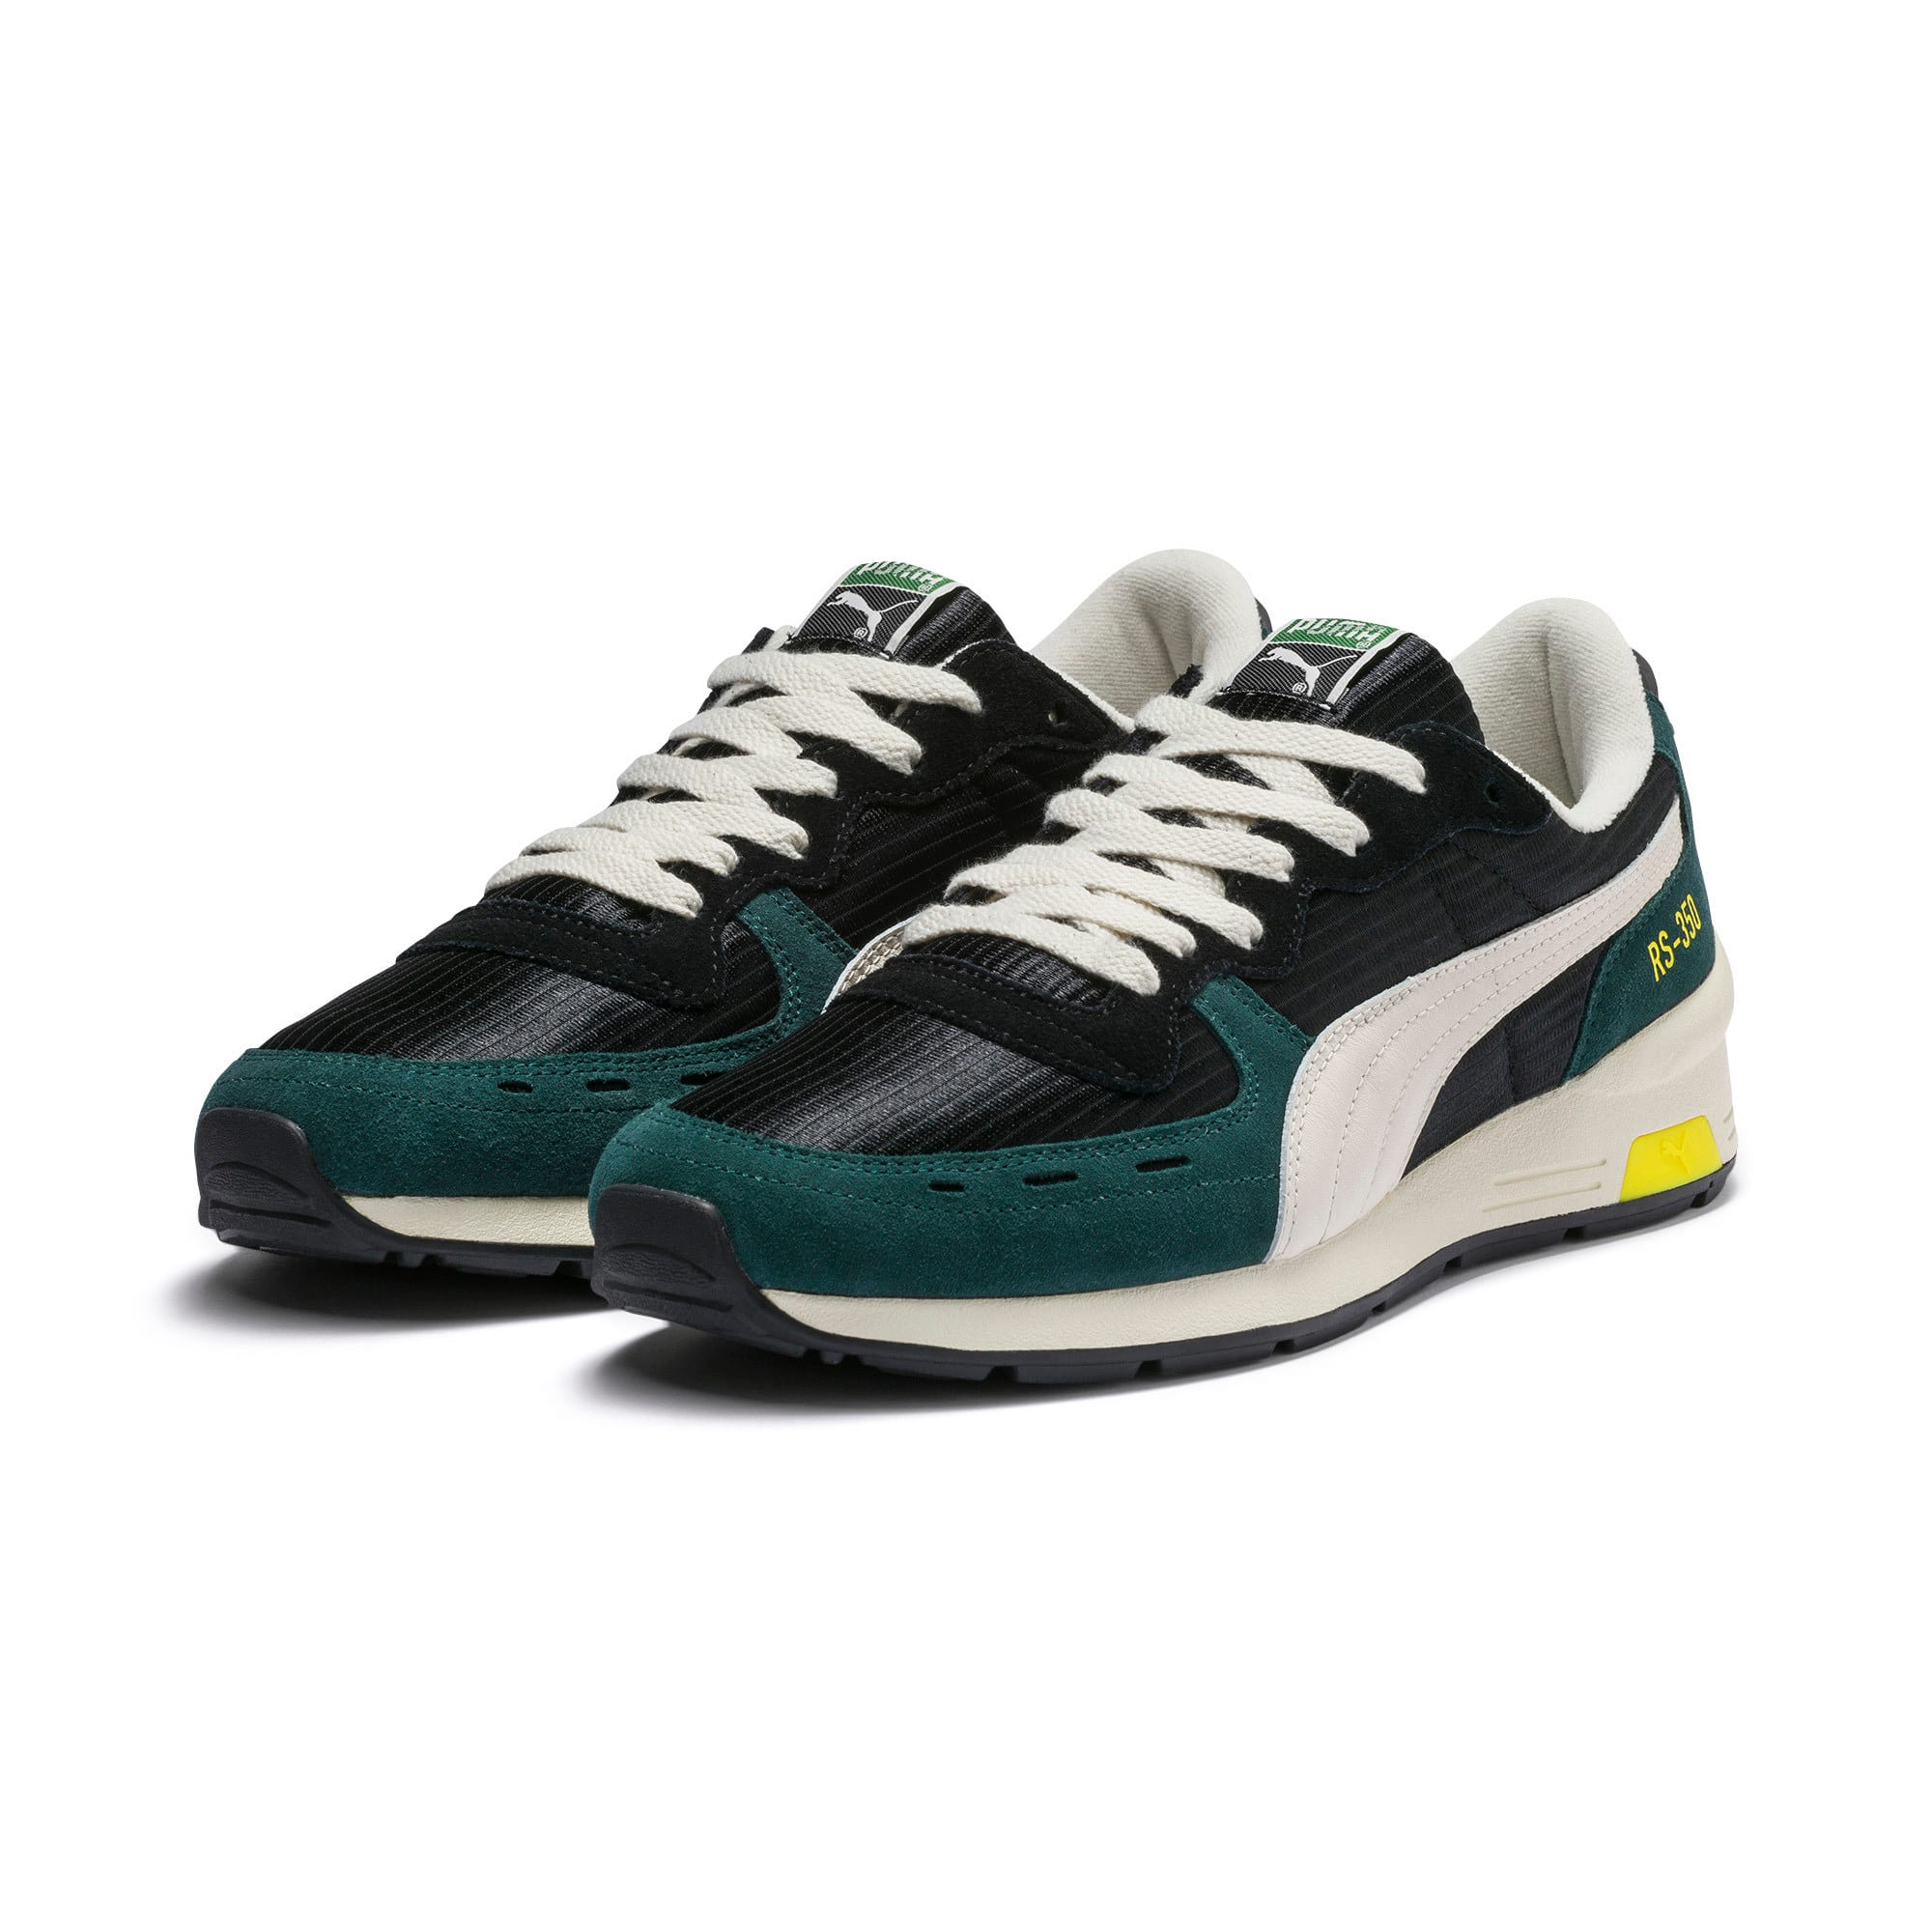 Thumbnail 3 of RS-350 OG Men's Sneakers, Puma Black-Ponderosa Pine, medium